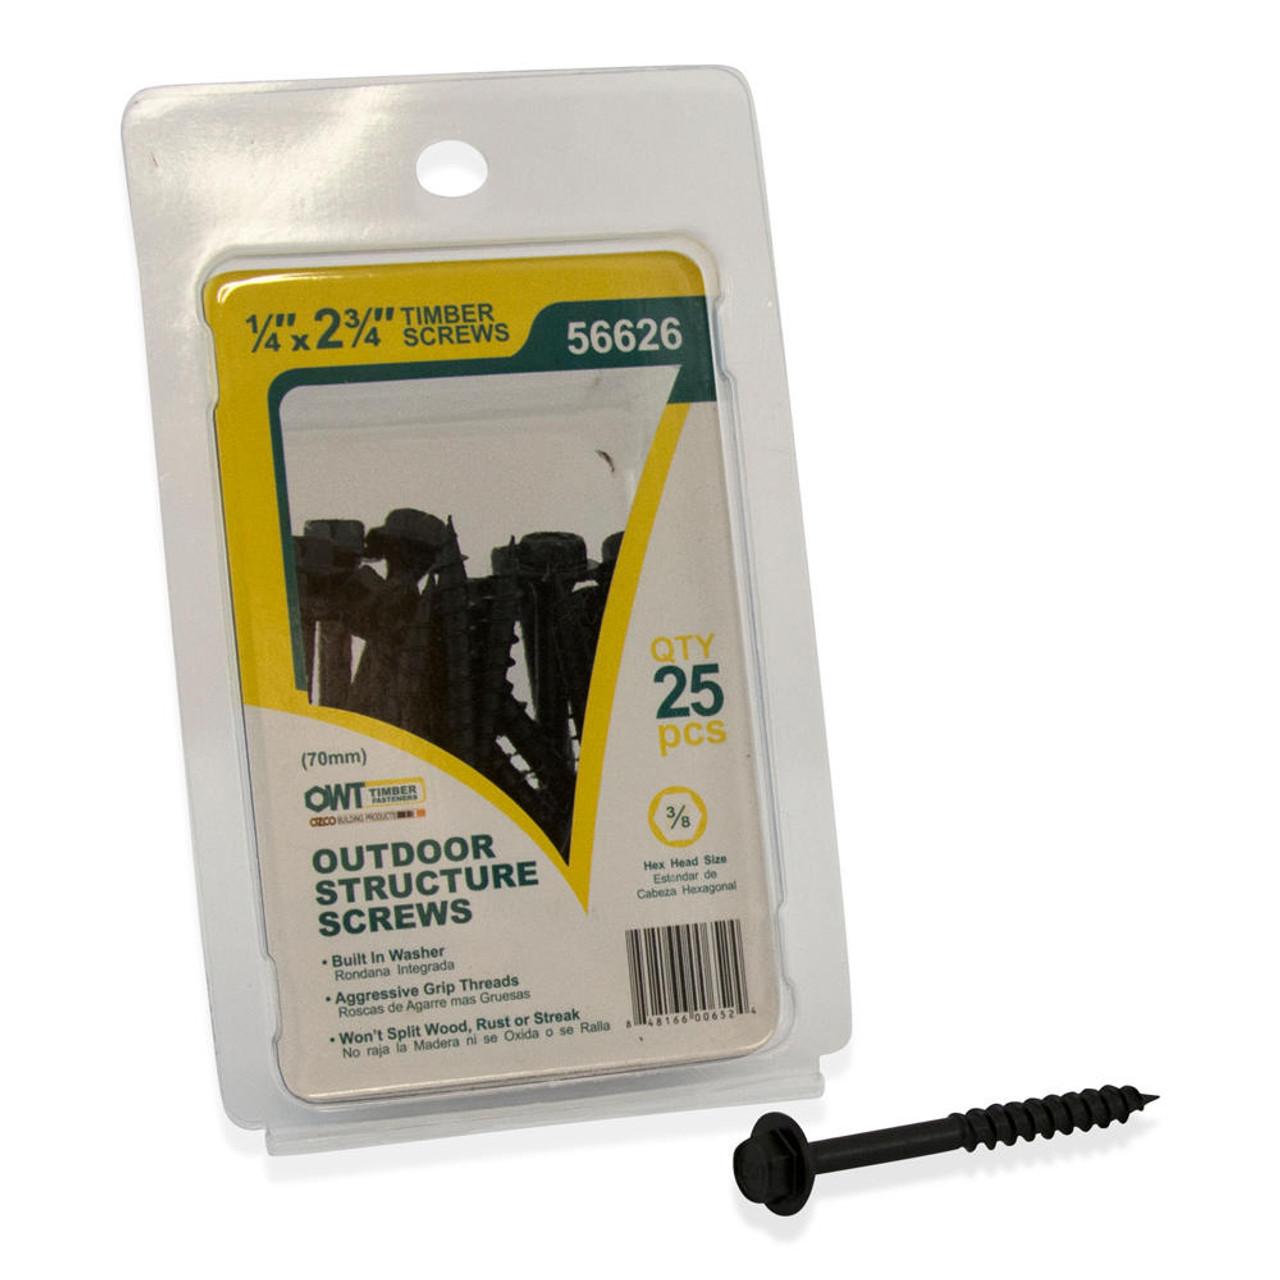 "OZCO OWT Hardware 2-3/4"" Timber Screws - 25 Pack"